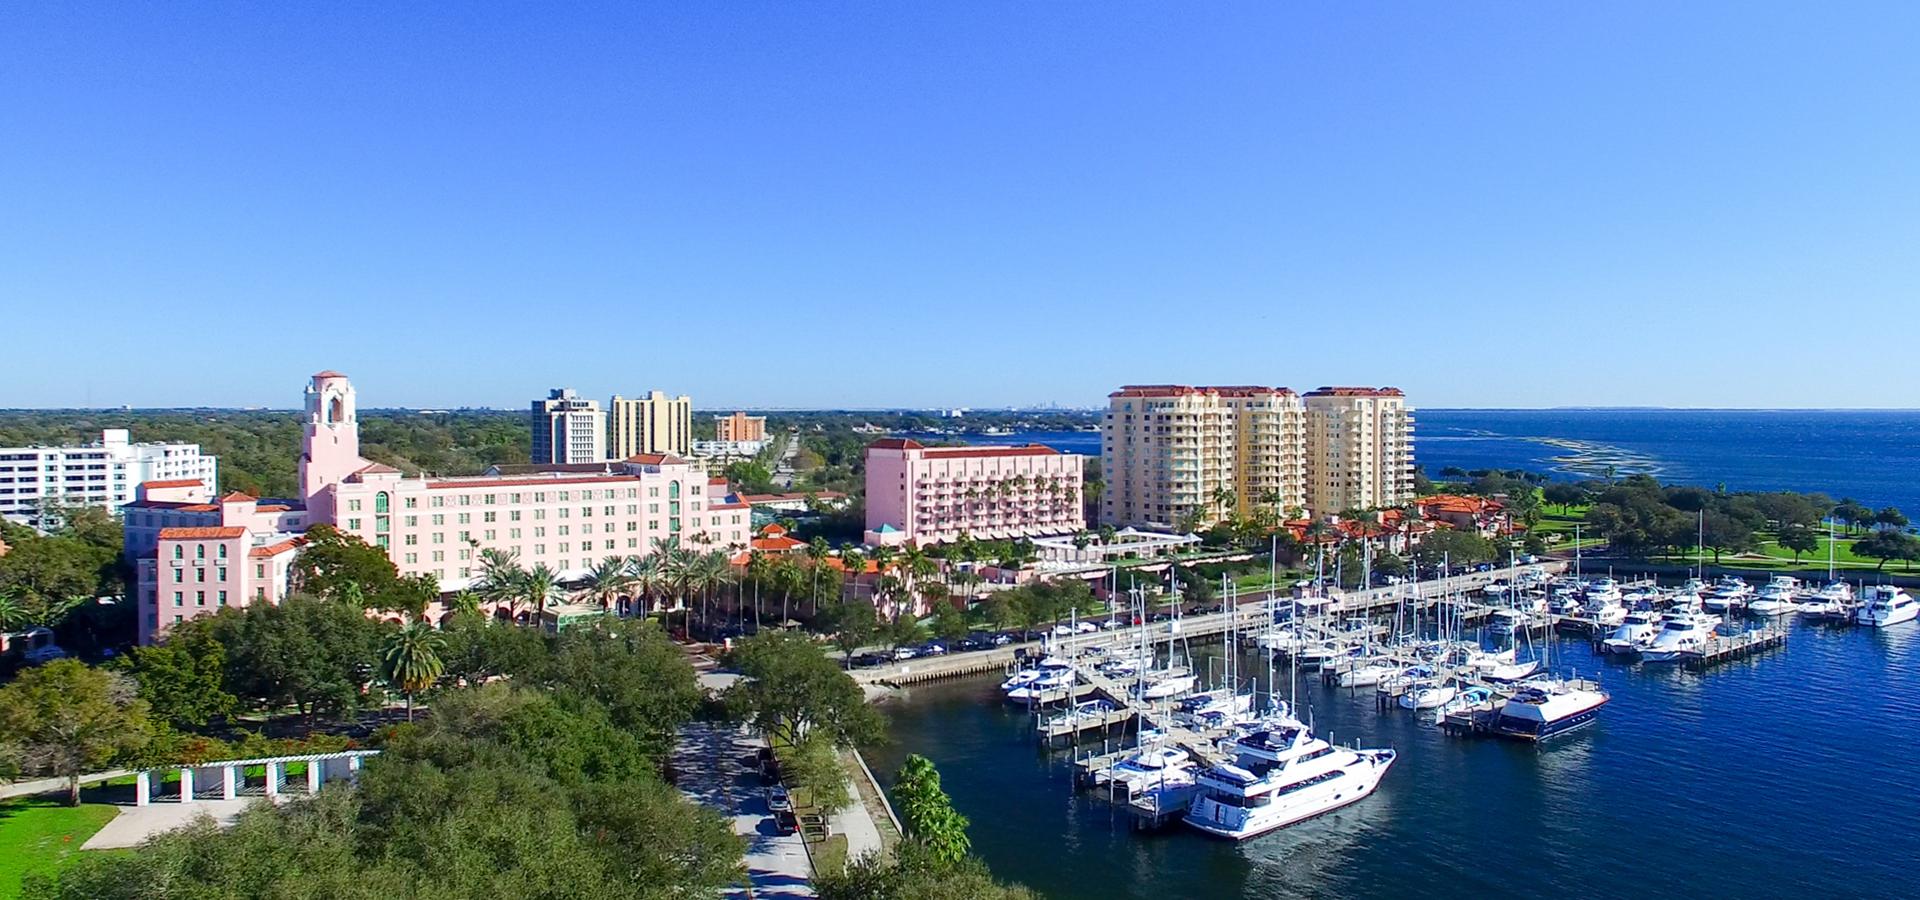 St. Petersburg, Tampa Bay, Florida, USA